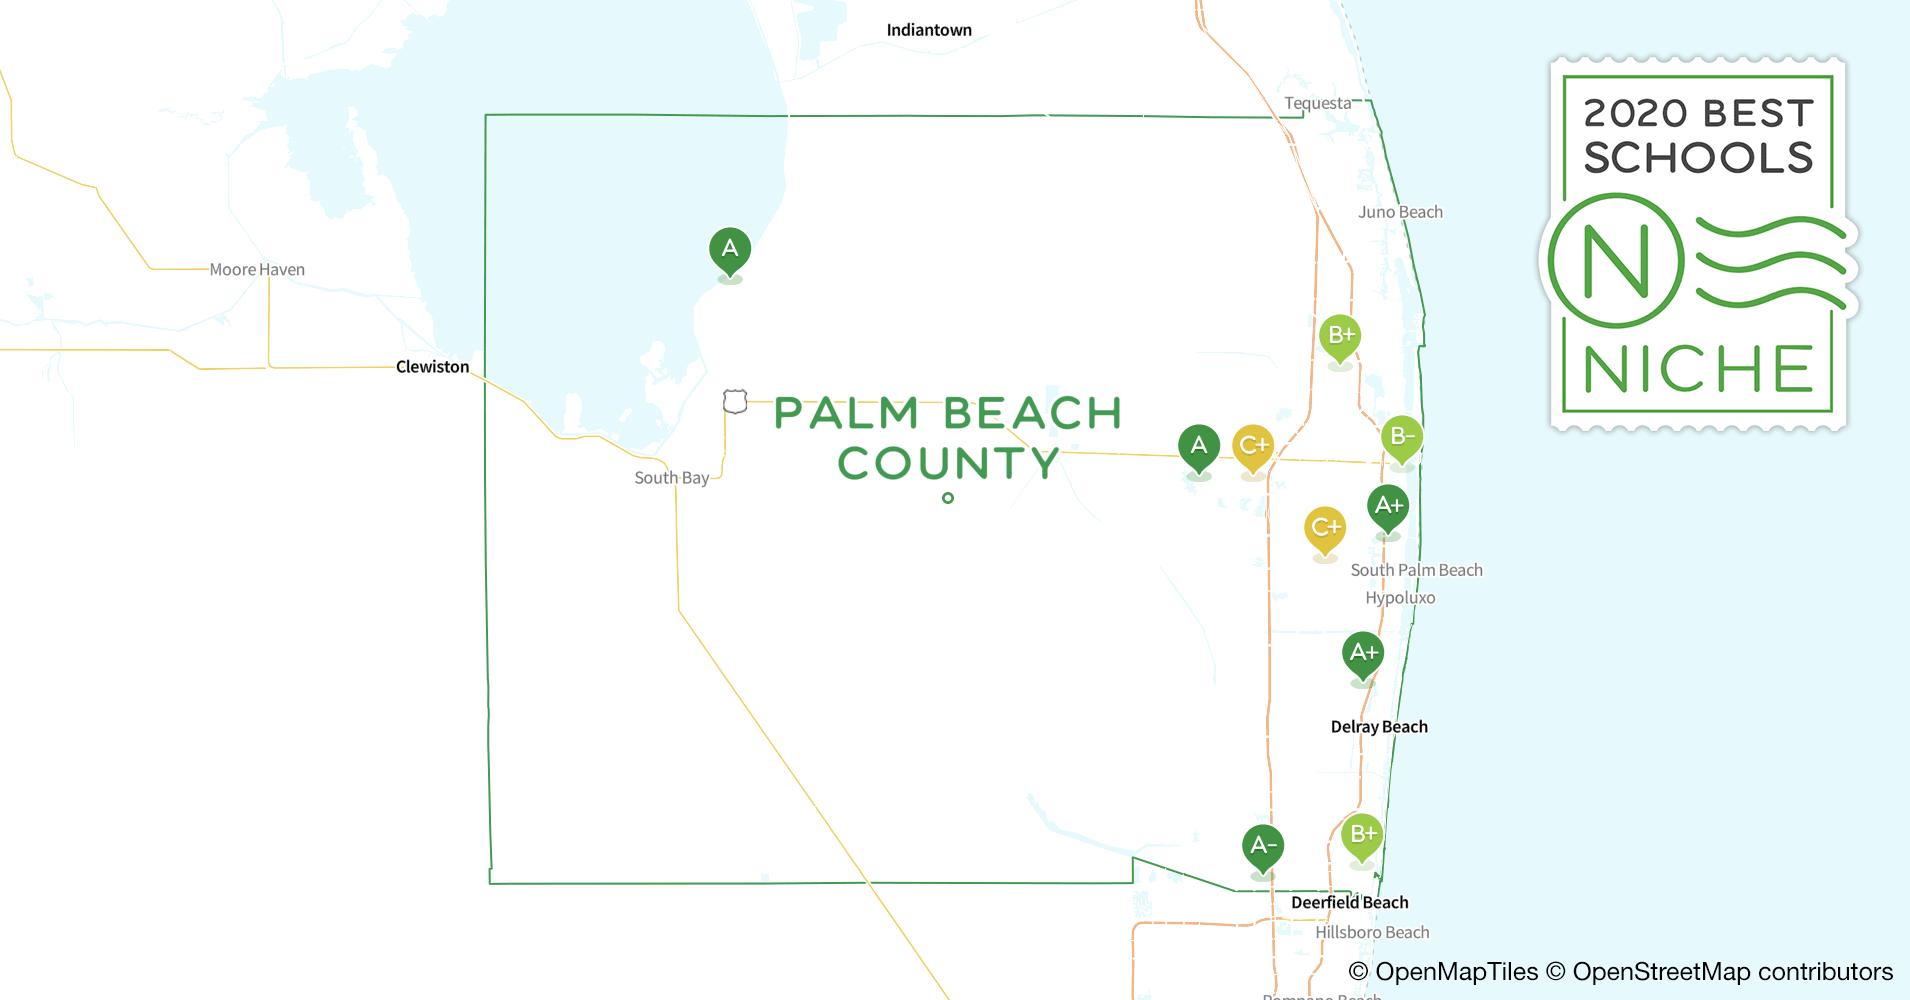 2020 Best Public Elementary Schools in Palm Beach County, FL